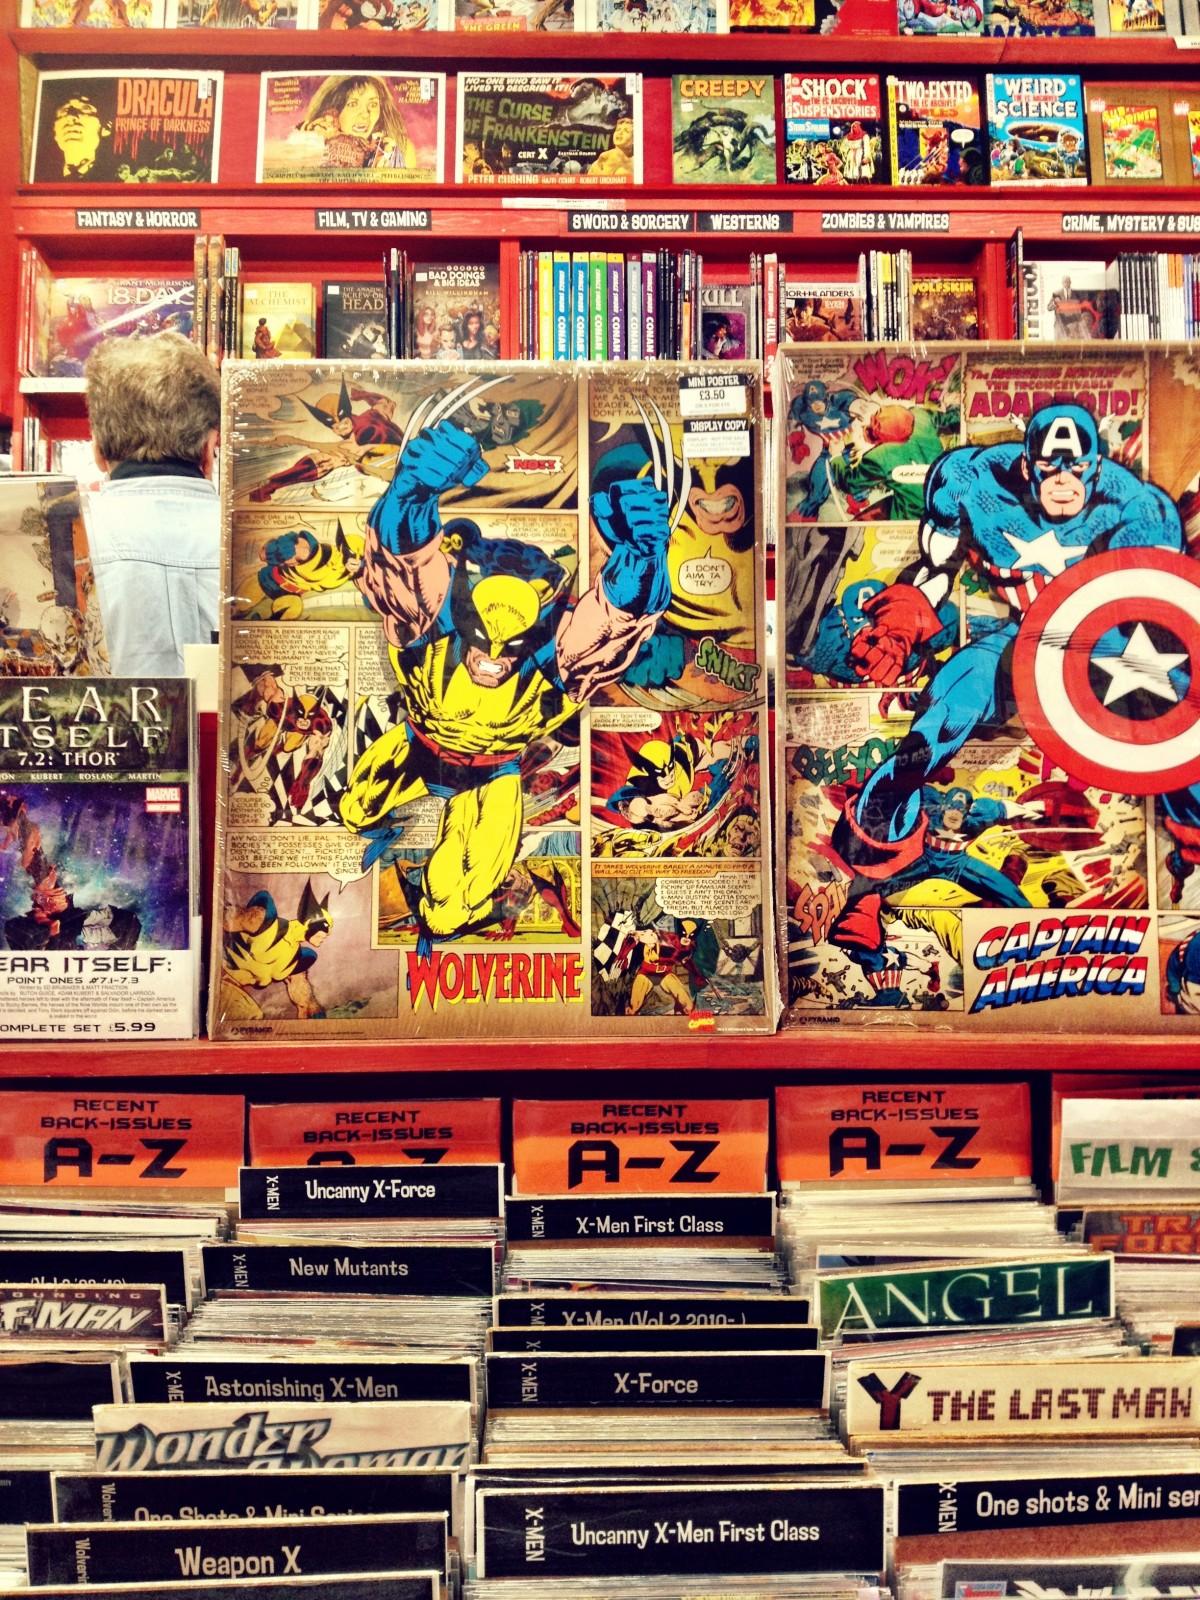 Free Images : dc, fiction, anime, marvel, comics ...